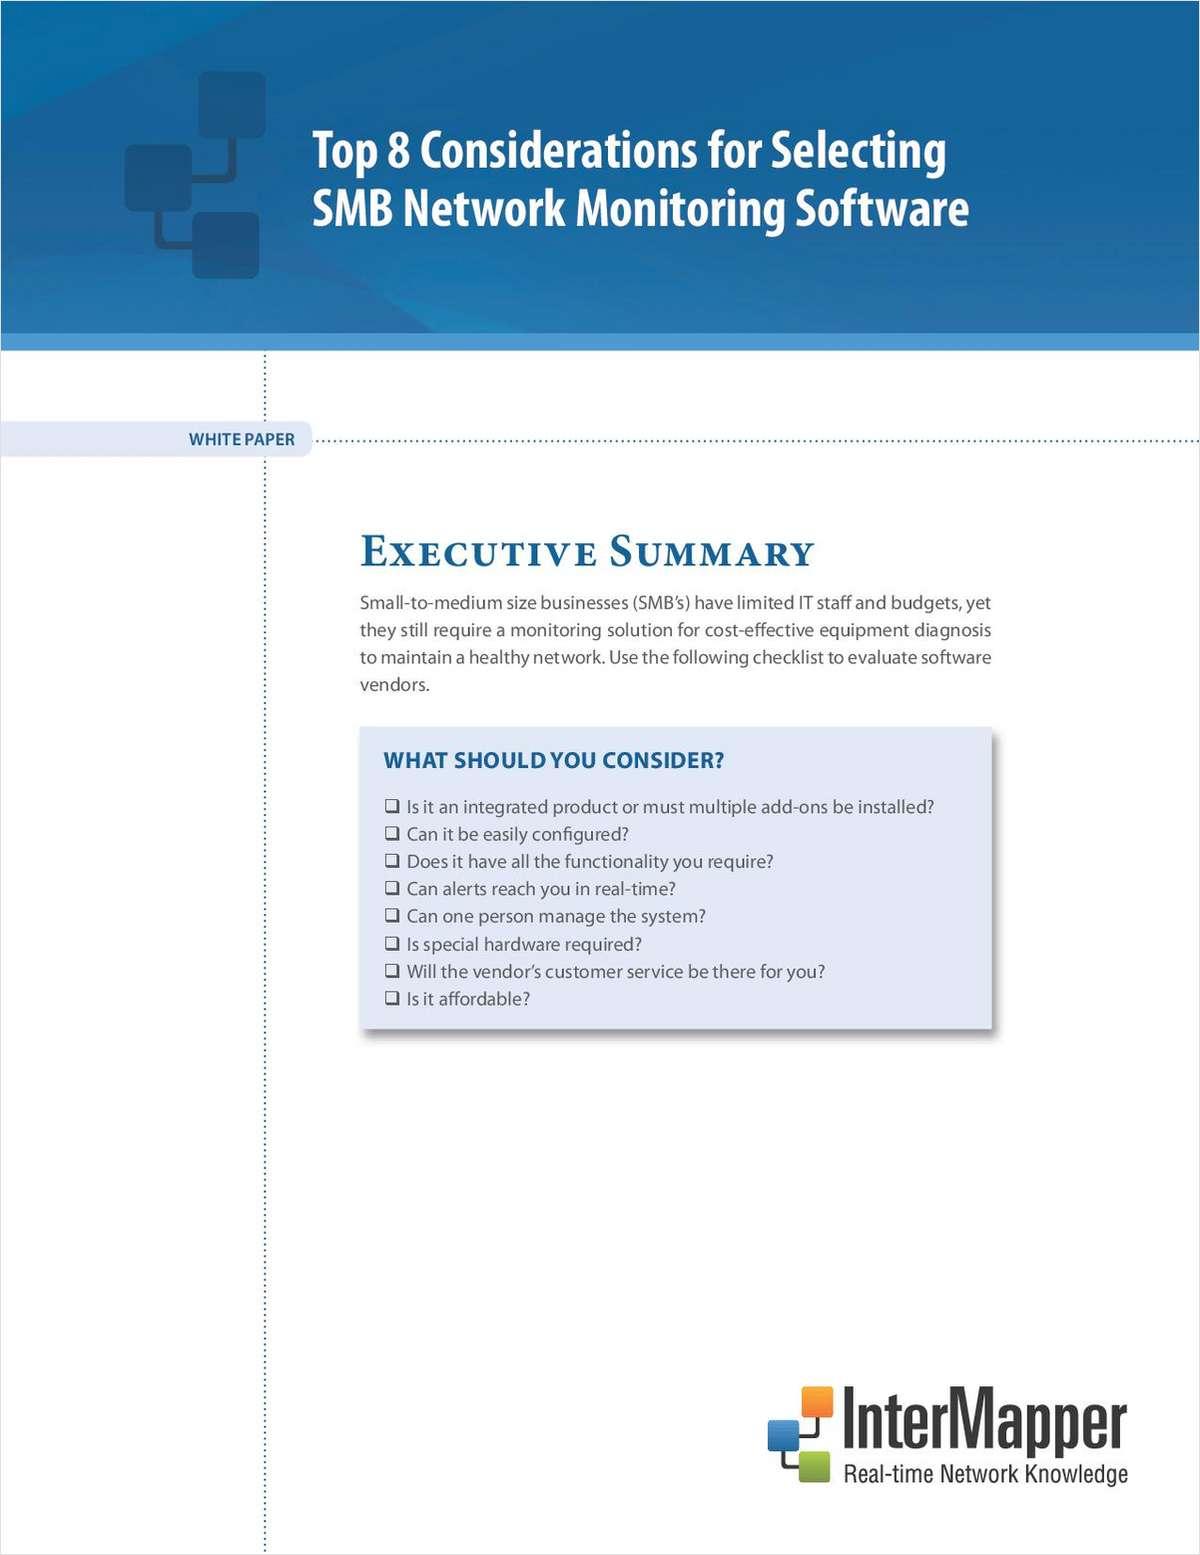 Top 8 Considerations for Selecting SMB Network Monitoring Software